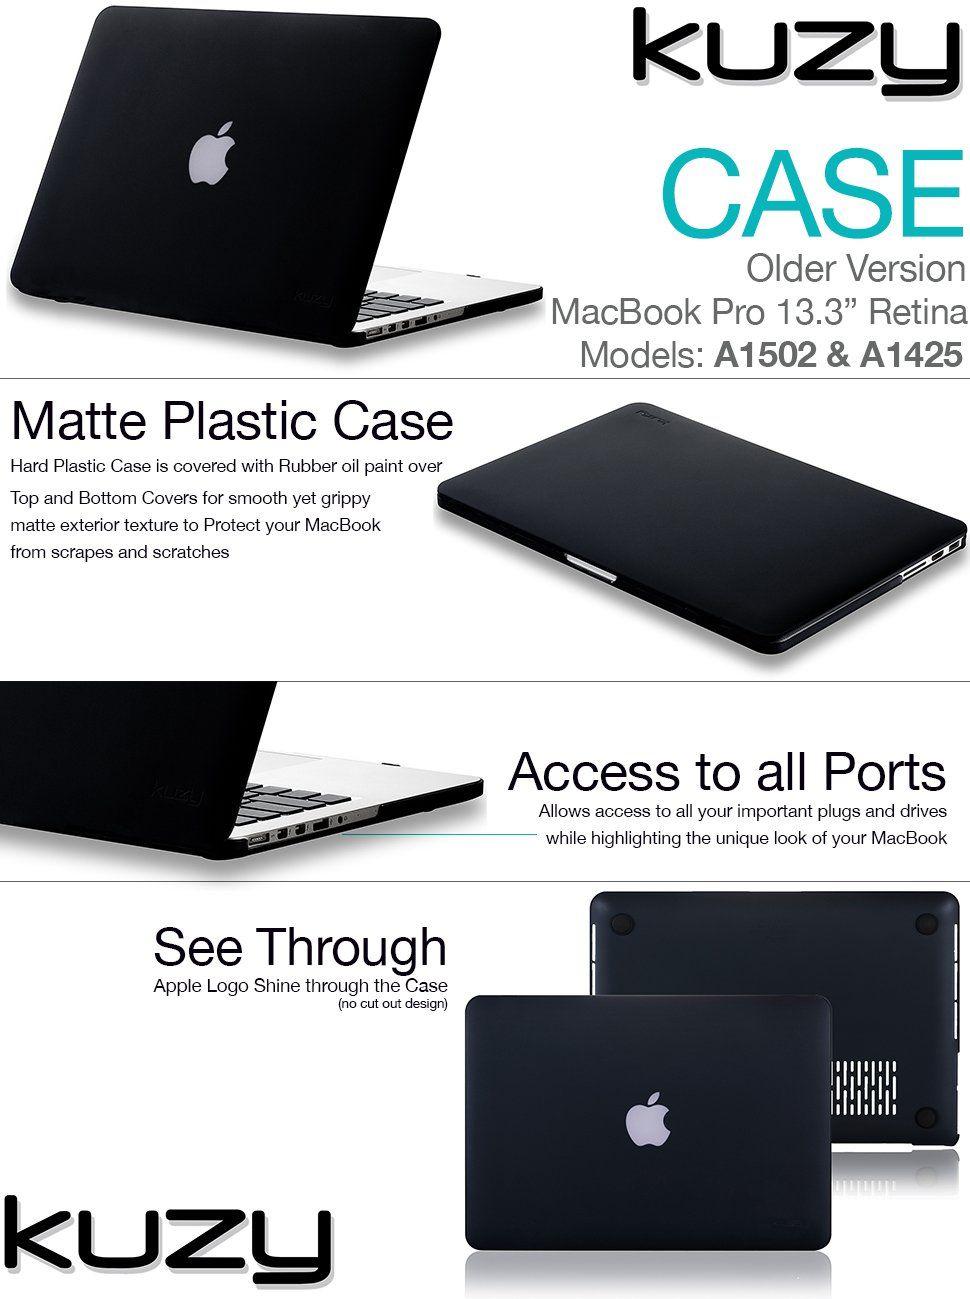 super popular 50b54 6a527 Amazon.com : Kuzy - Rubberized Hard Case for Older MacBook Pro 13.3 ...